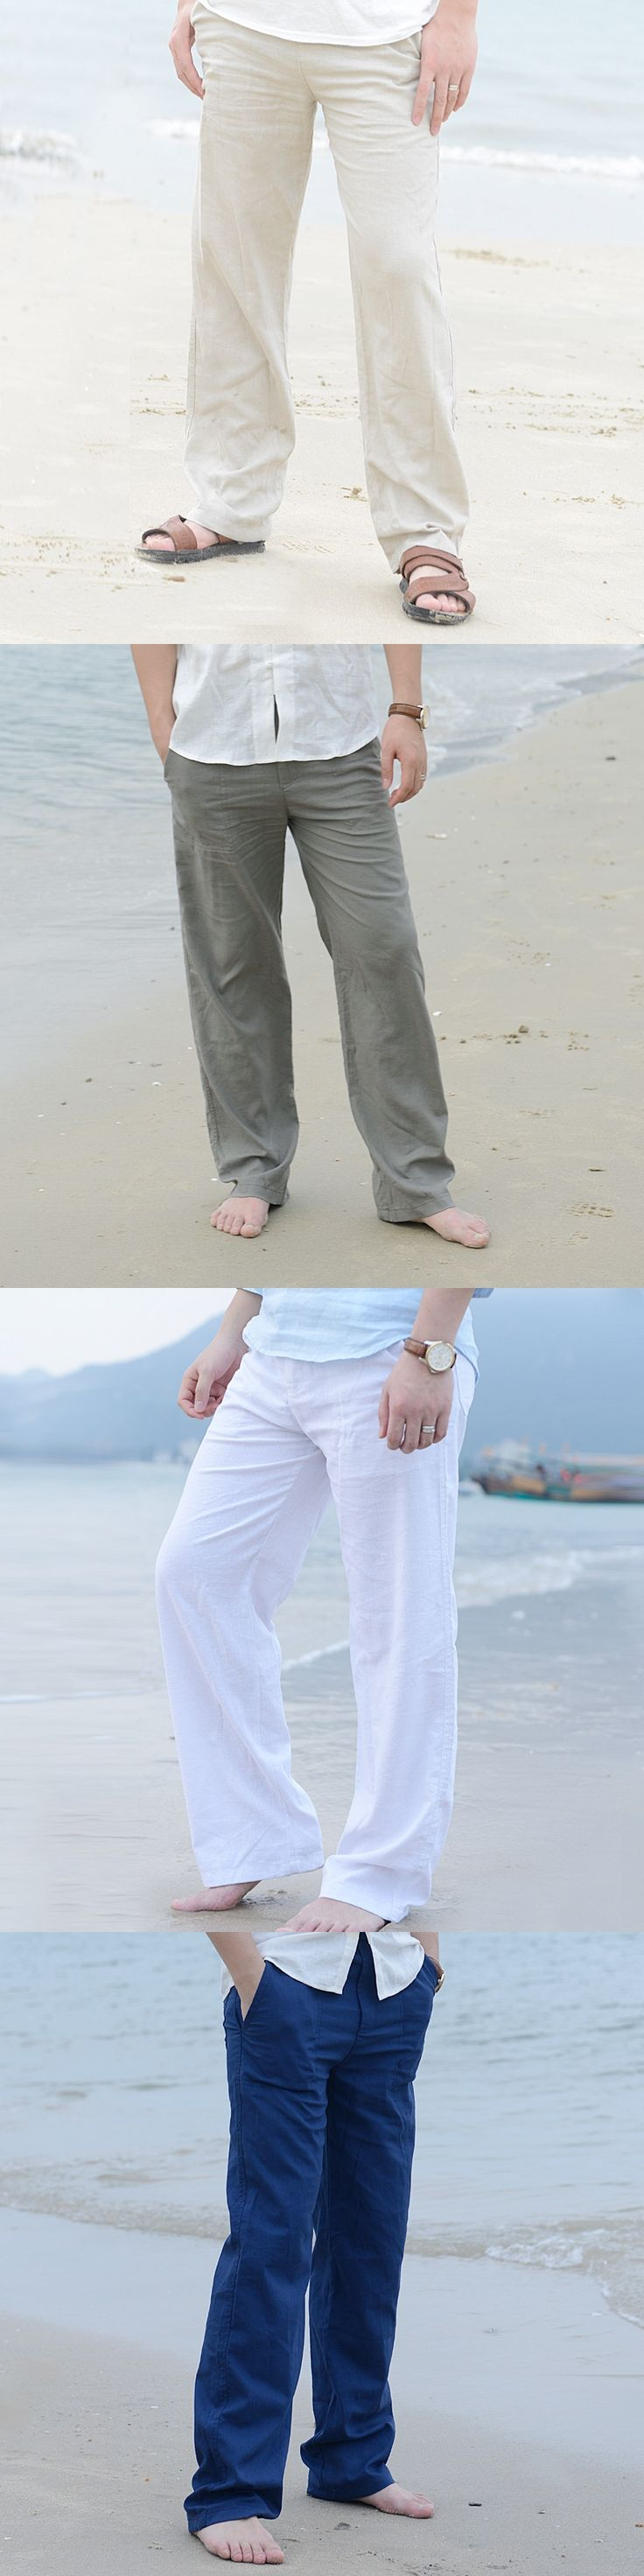 Men's Summer Casual Pants Natural Cotton Linen Trousers White Linen Elastic Waist Straight Pants